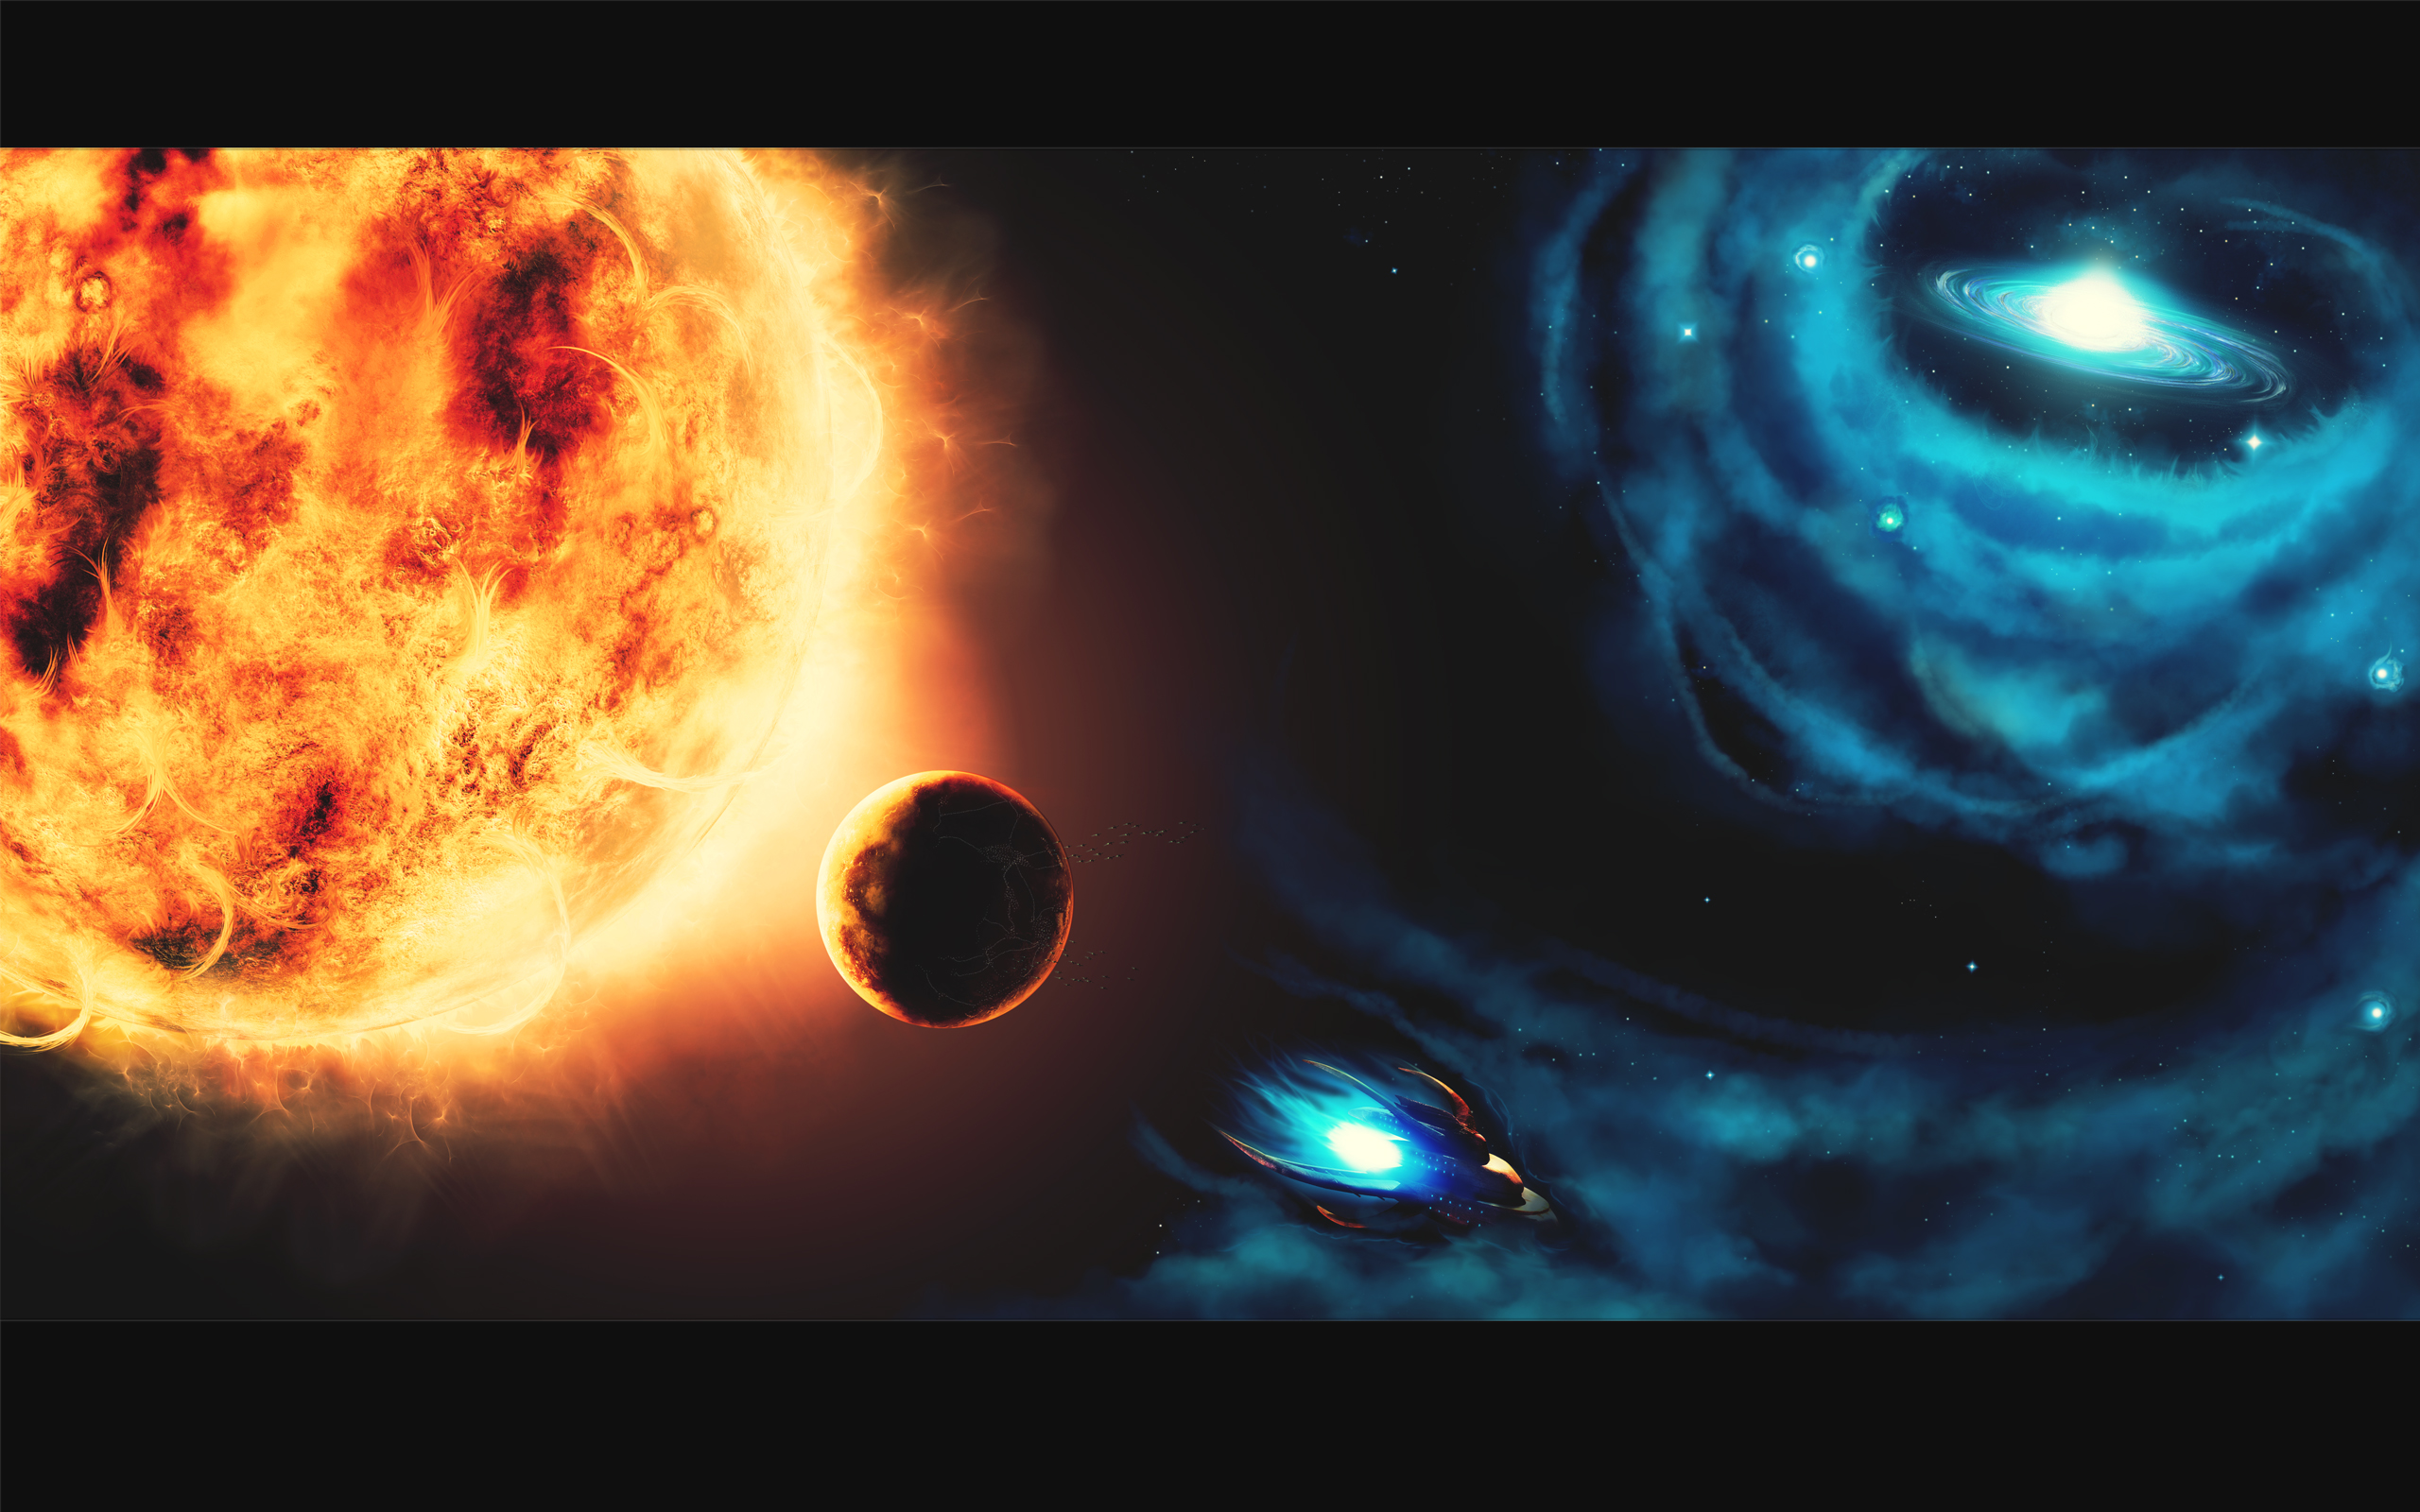 Cosmos7418318839 - Cosmos - Nebulae, Cosmos